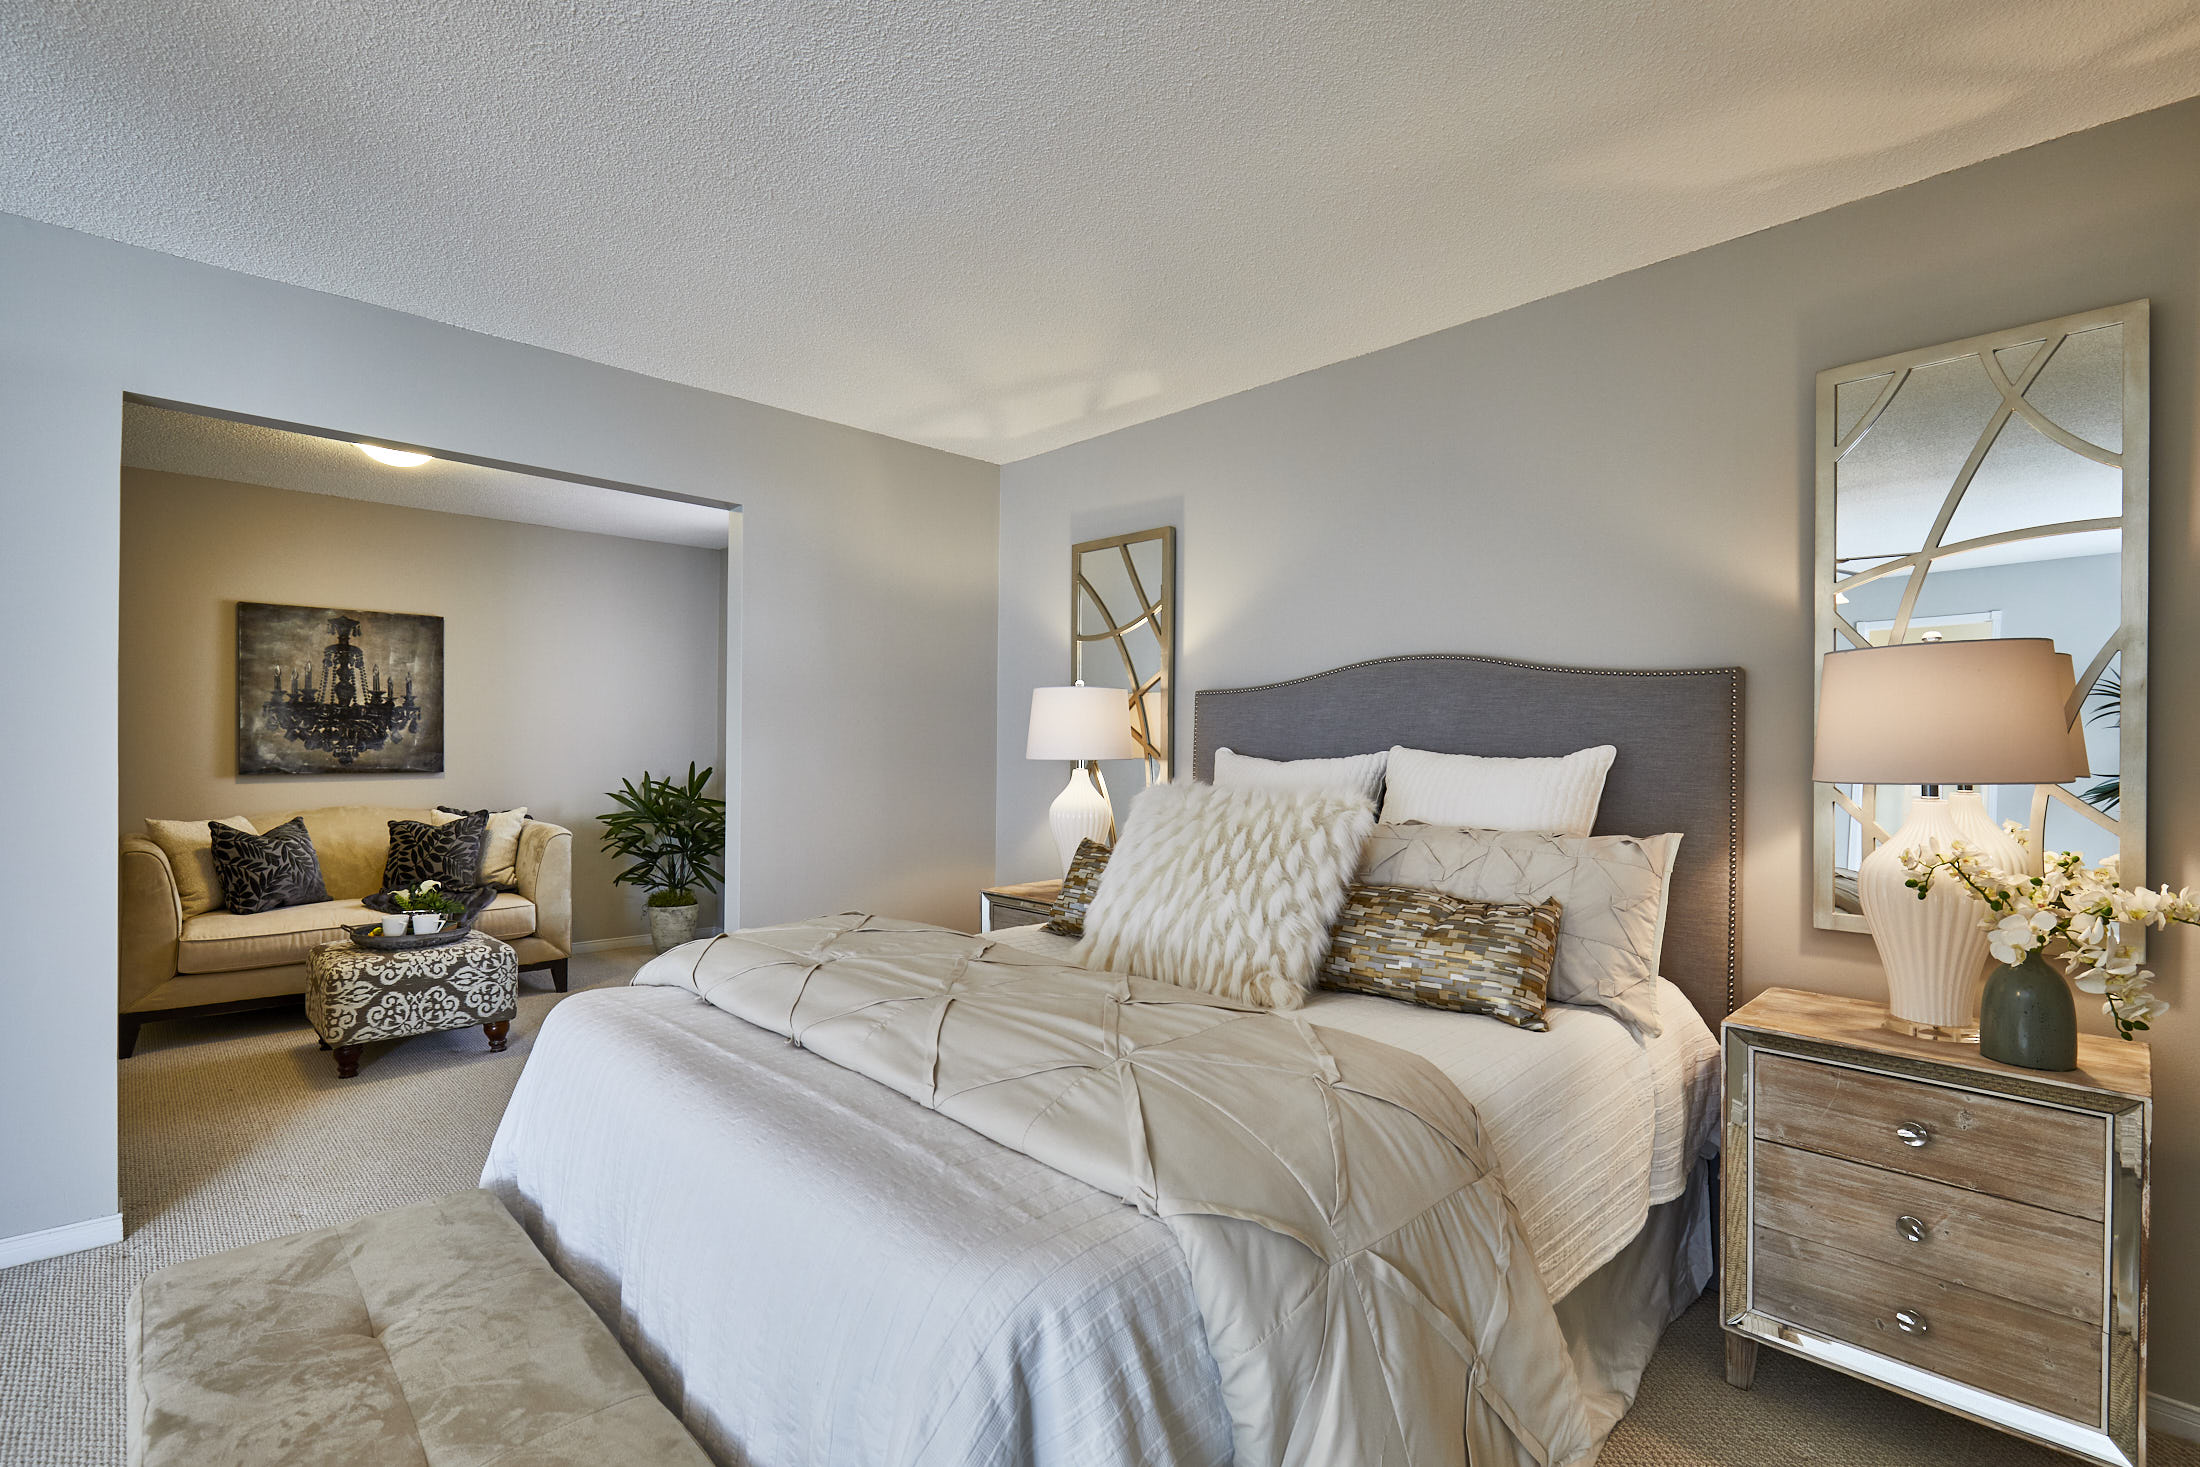 Luxury Master Bedroom - Sitting Room - Home Staging - Durham Region